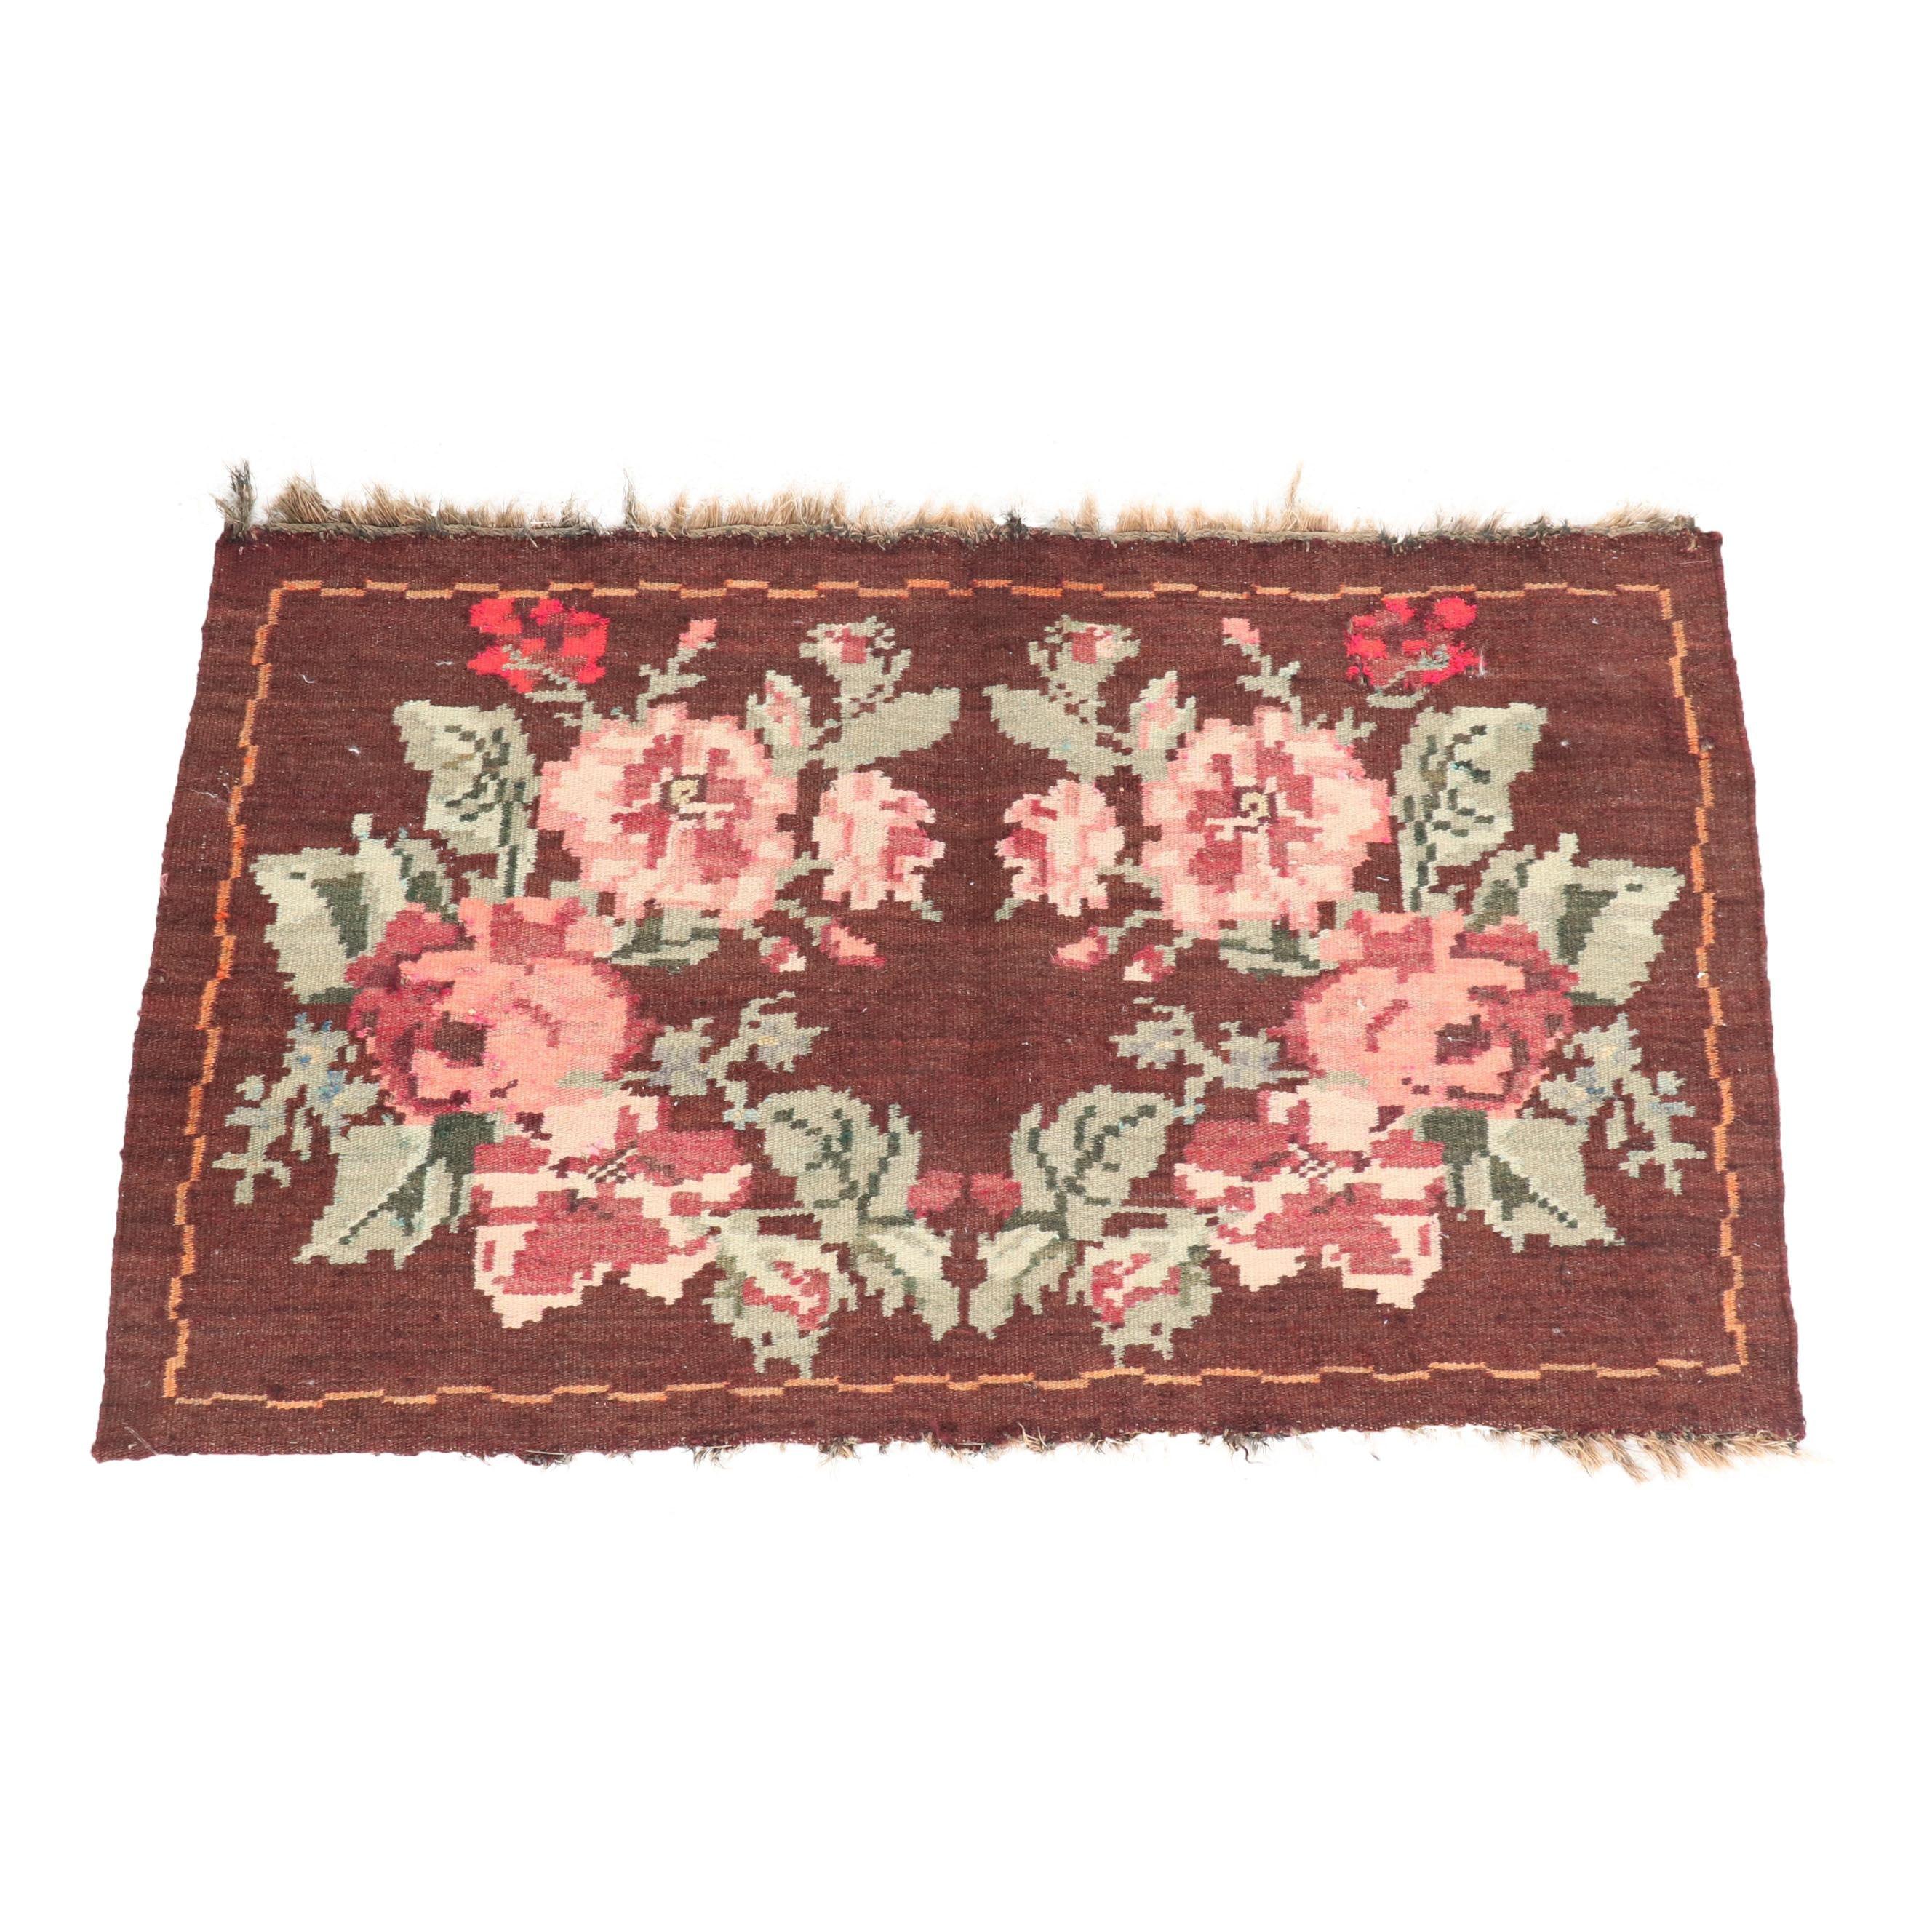 Handwoven Turkish Aubusson Style Wool Kilim Rug